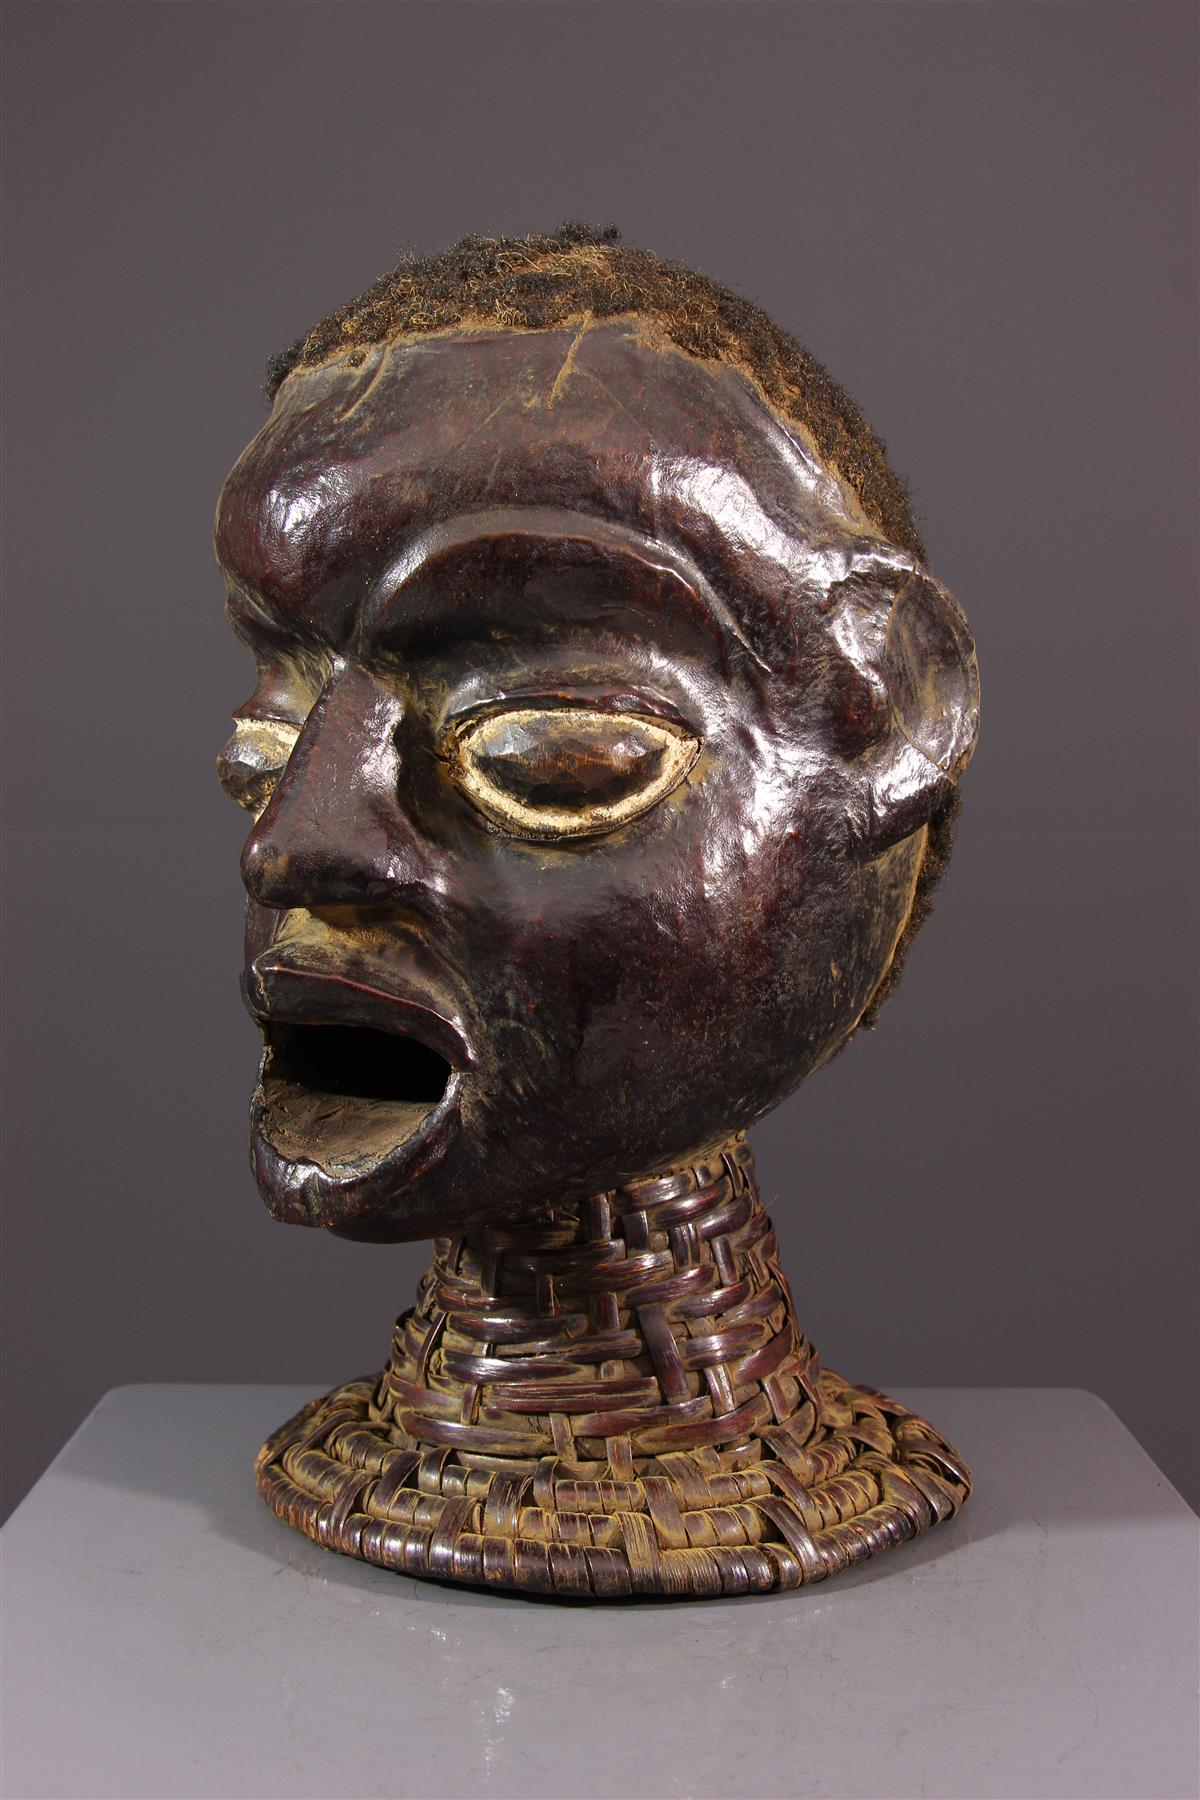 Crest Ekoi/Ejagham Mask - African art